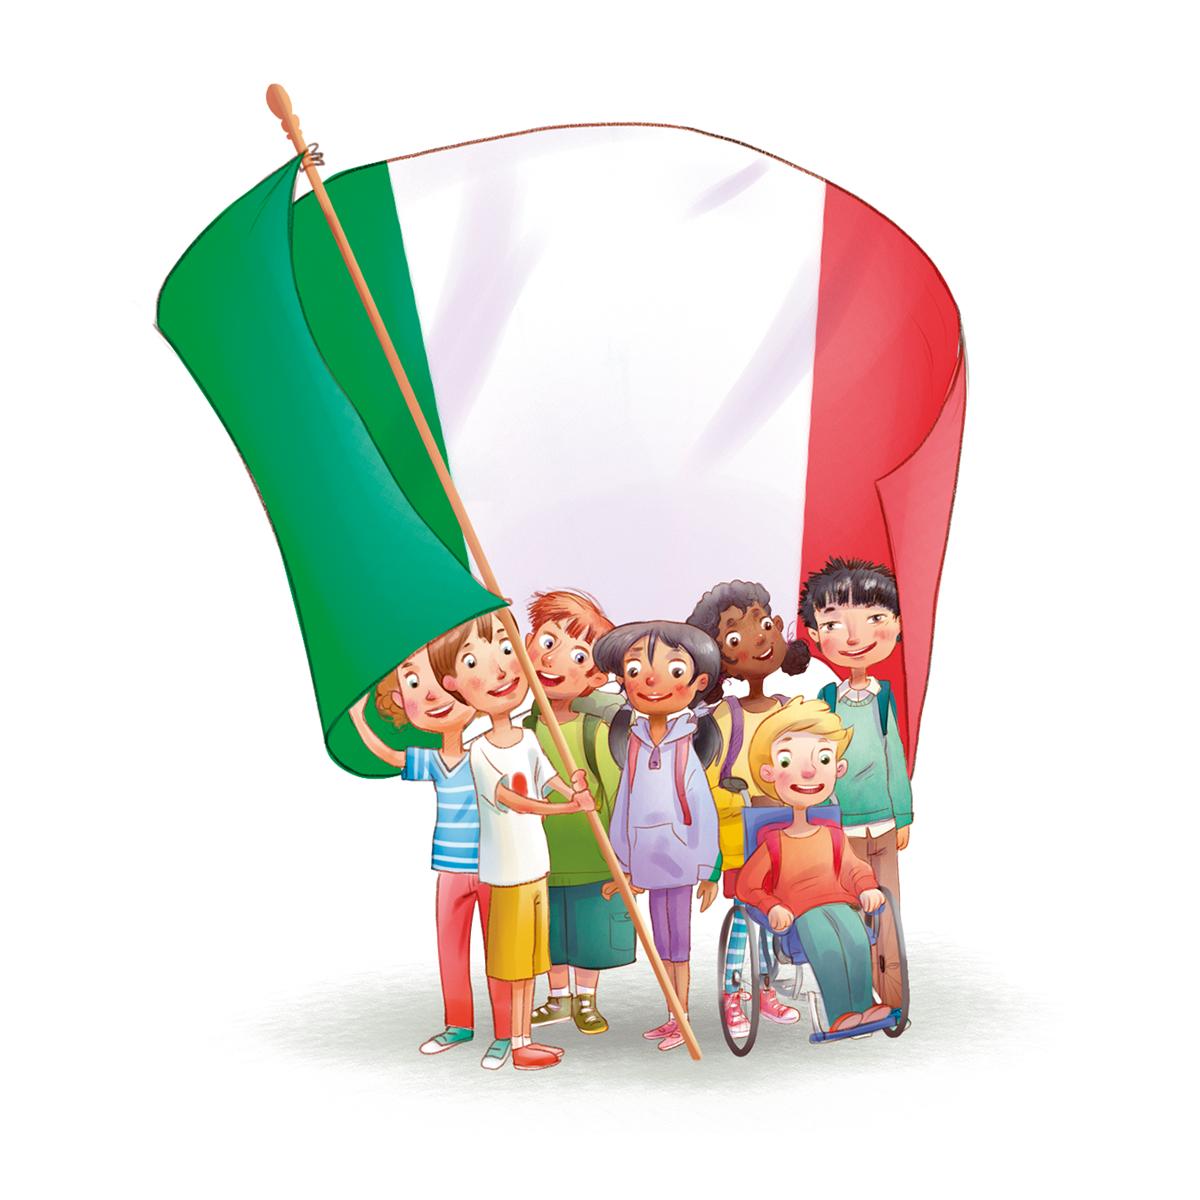 La Costituzione Italiana Iii - Lessons - Tes Teach